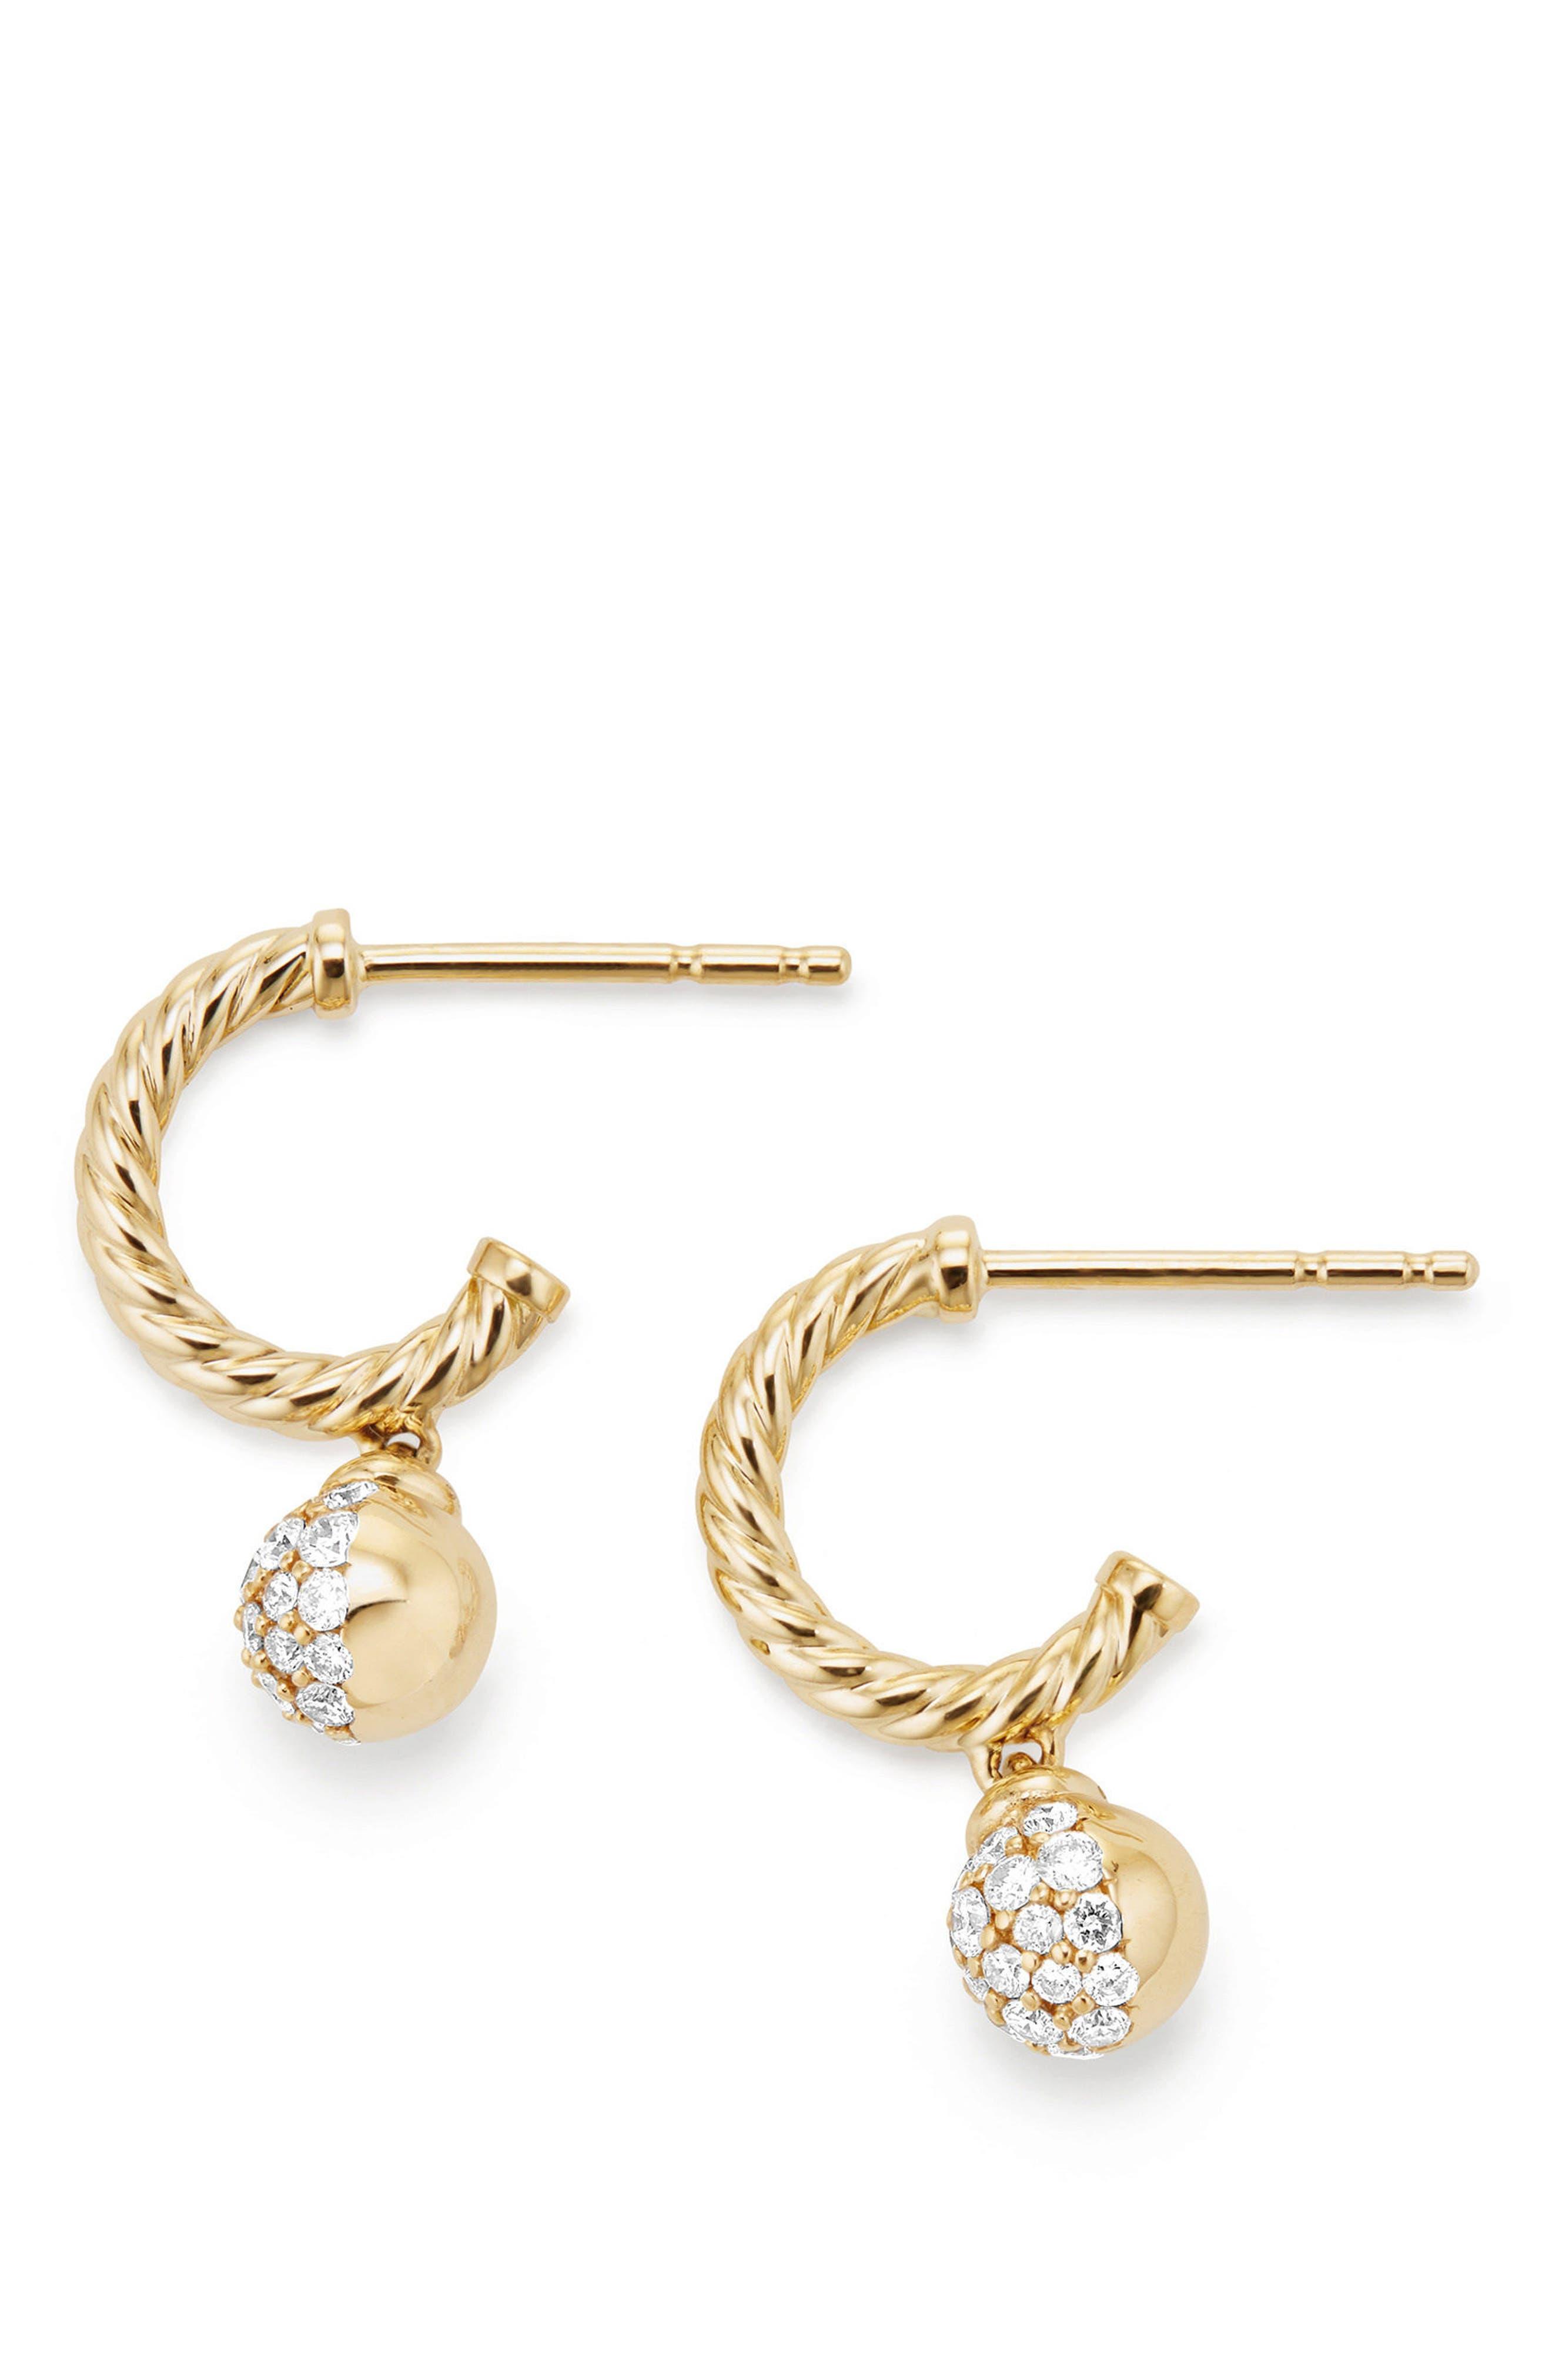 Petite Solari Hoop Pavé Earrings with Diamonds in 18K Gold,                             Main thumbnail 1, color,                             YELLOW GOLD/ DIAMOND